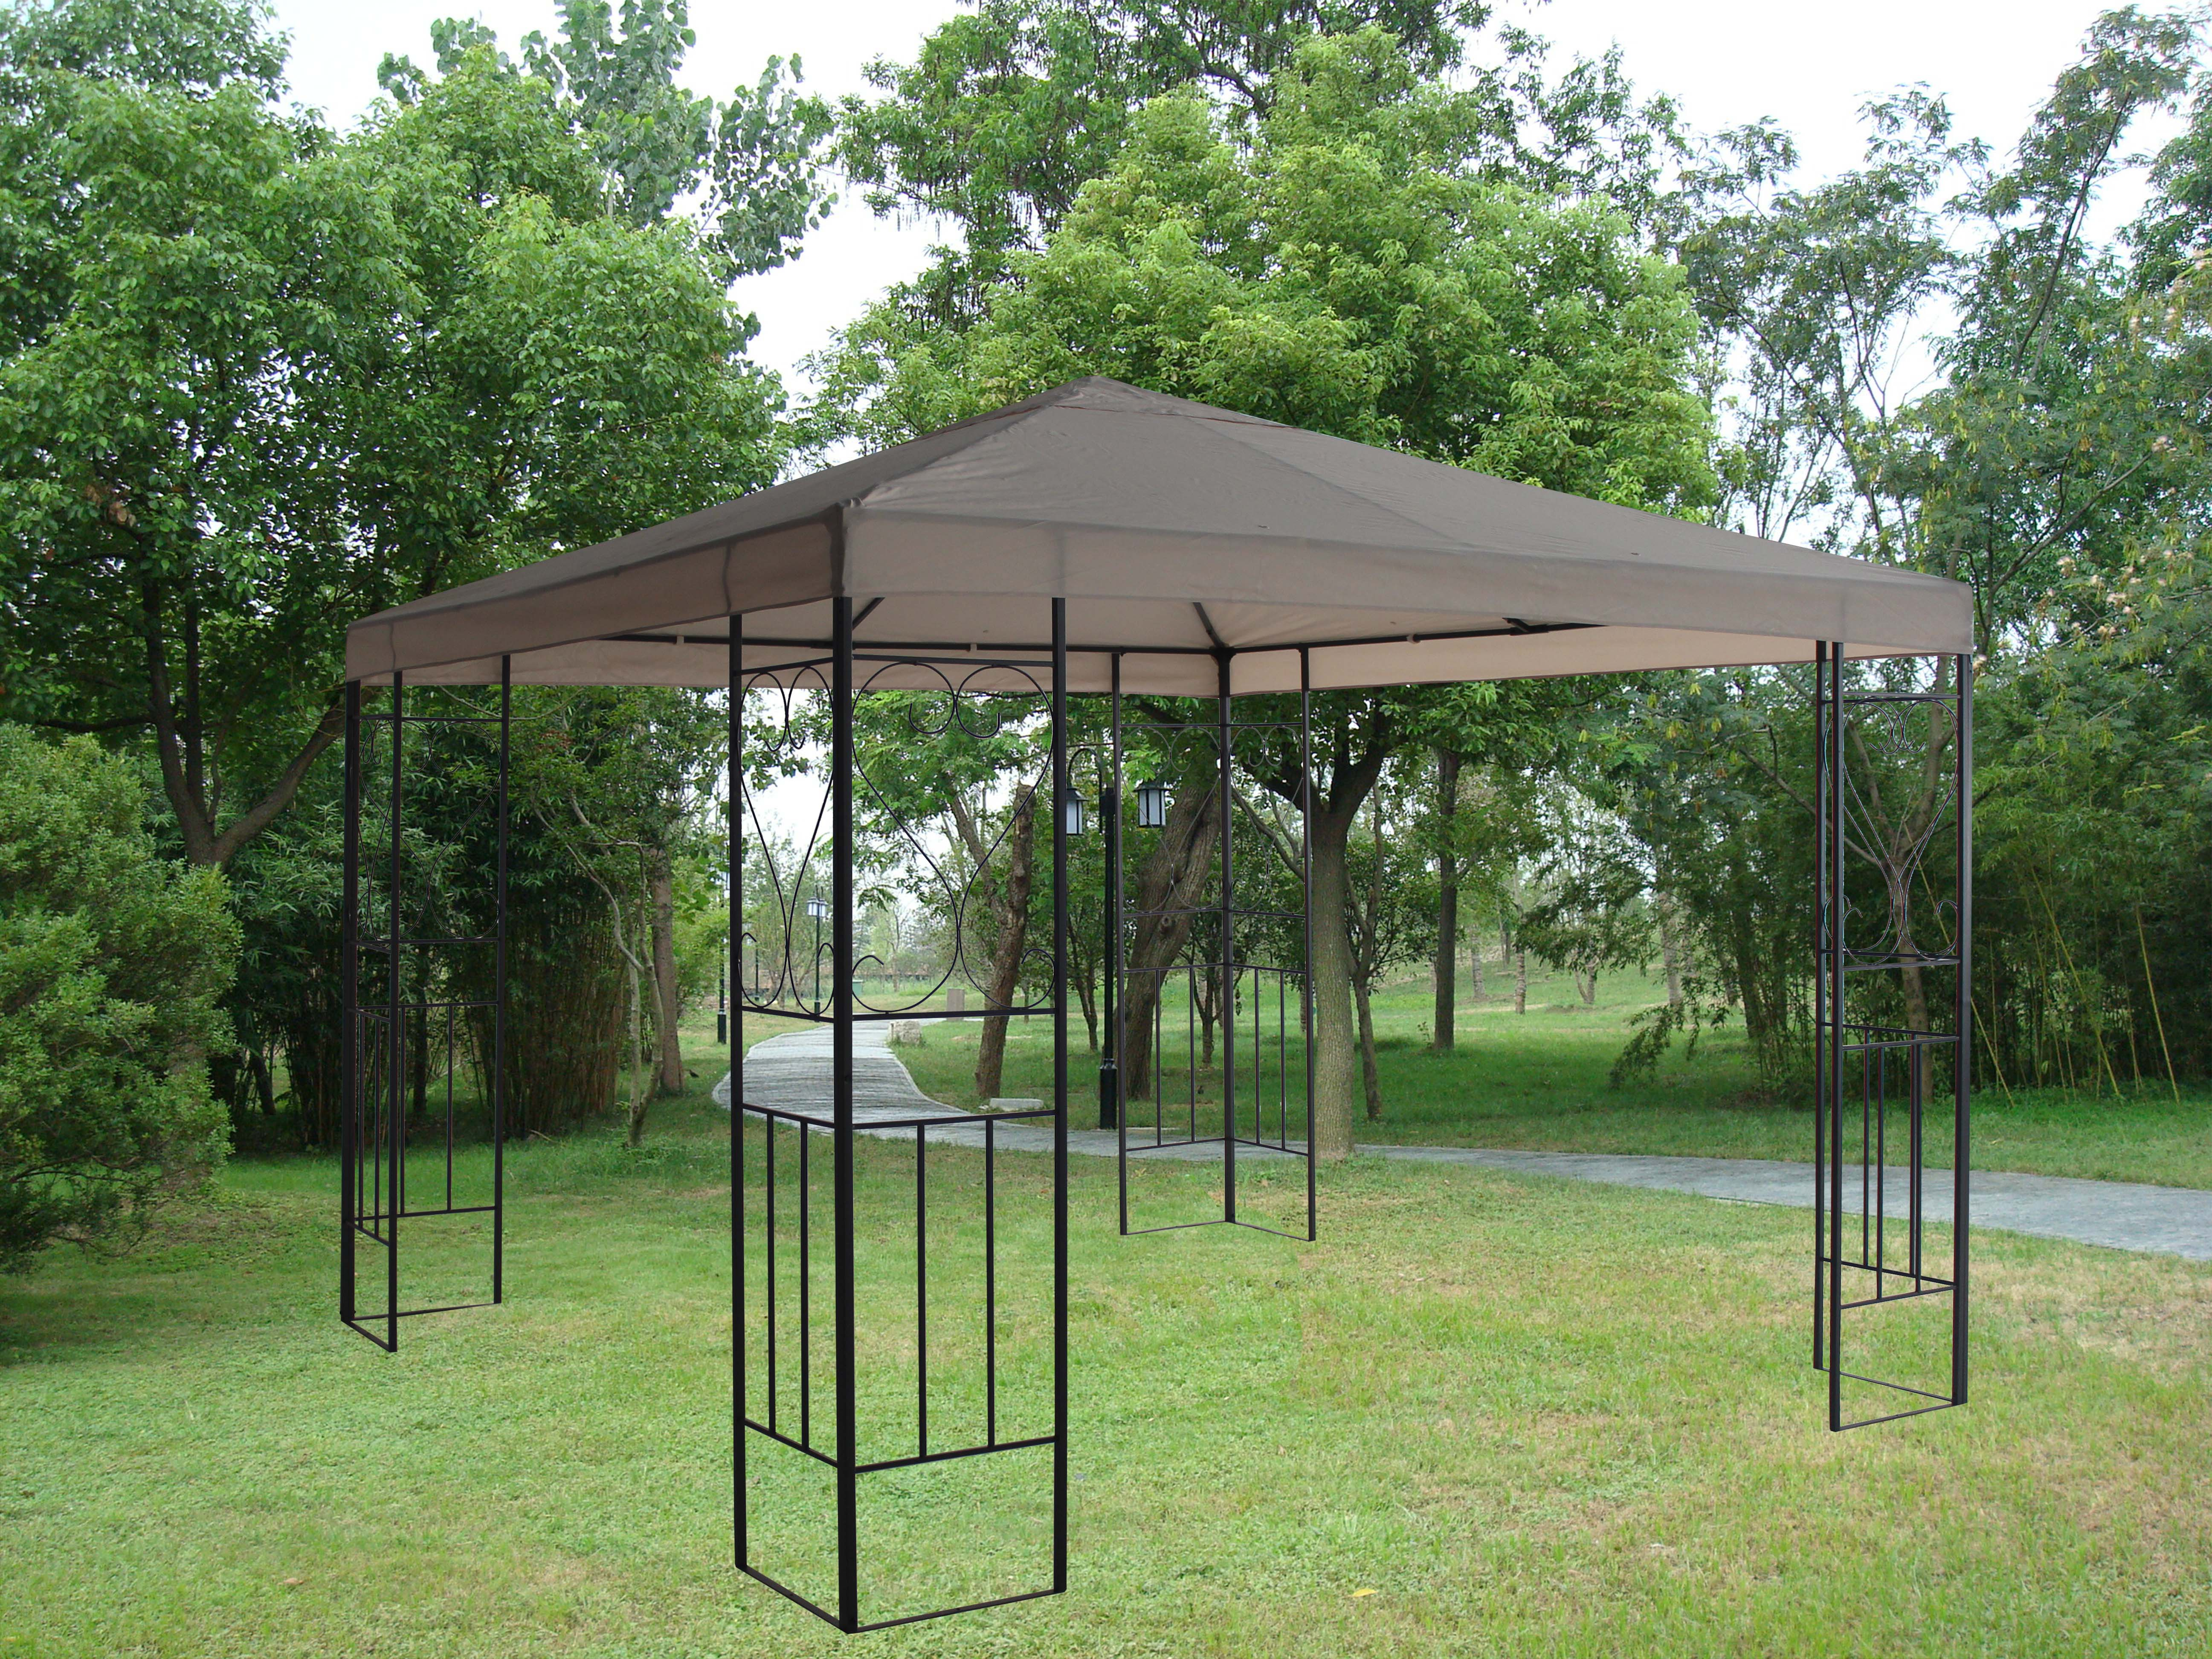 3x3 Garden Metal Gazebo Canopy Pavilion Shade Screen  : 1 from ebay.co.uk size 5187 x 3890 jpeg 2229kB